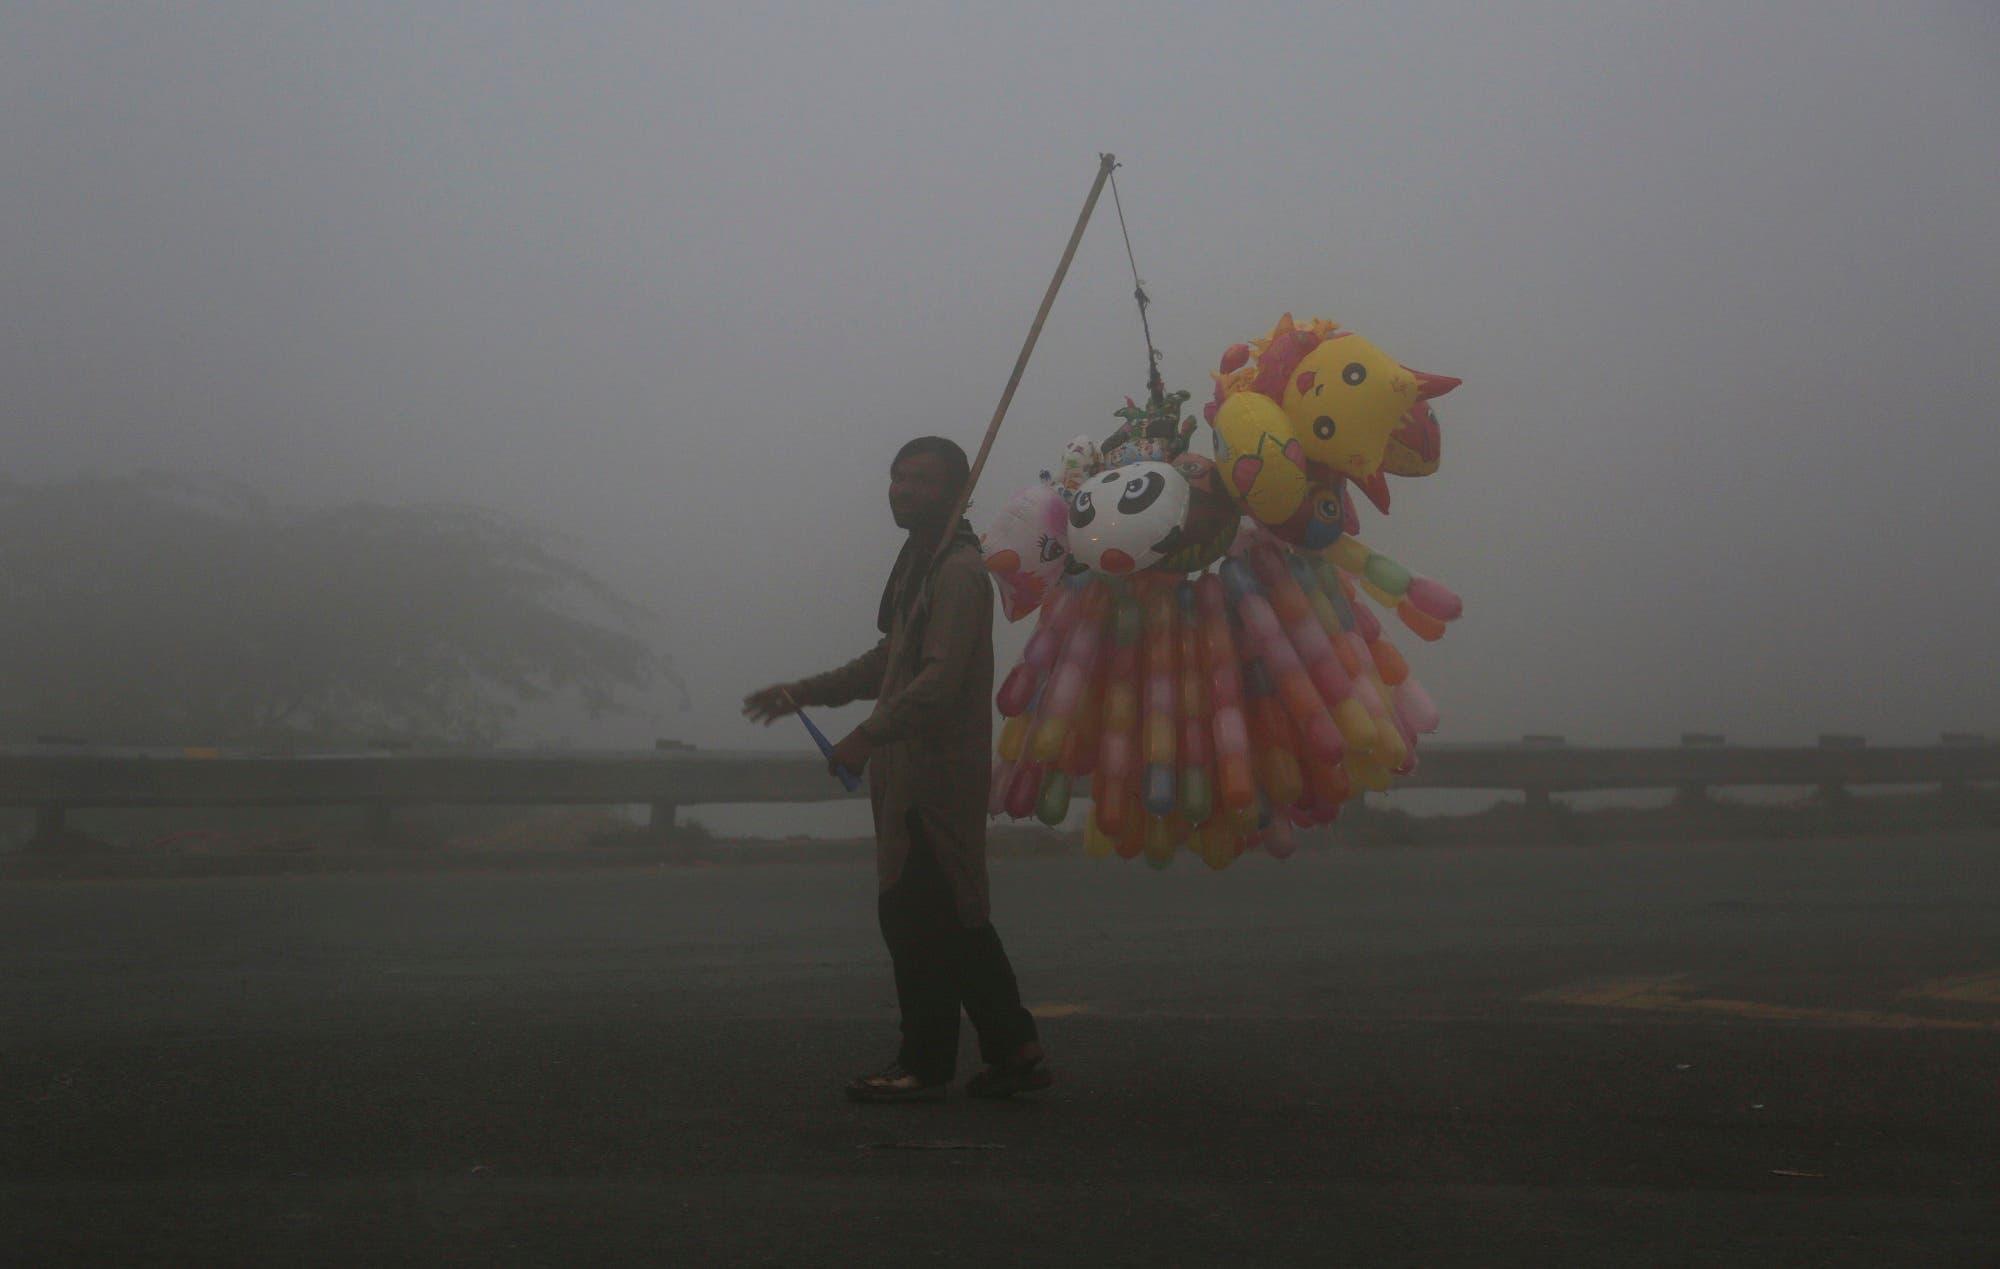 A Pakistani vendor sells balloons while fog envelopes the area in Lahore, Pakistan, on Nov. 8, 2017. (AP)